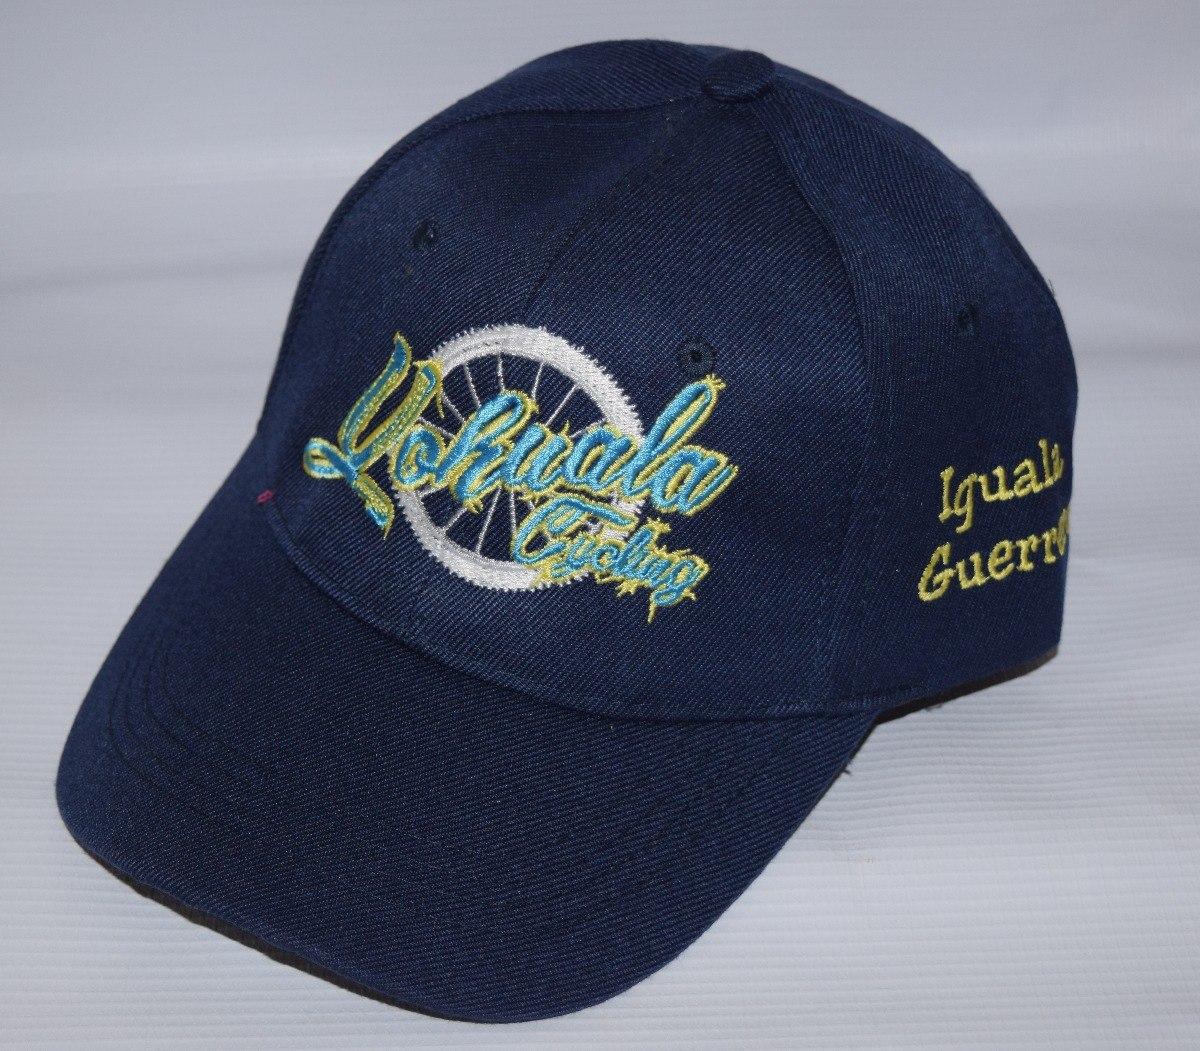 Gorras personalizadas bordadas dia del padre o papa cargando zoom jpg  1200x1051 Metalico gorras personalizadas bordadas 26428acdcc3